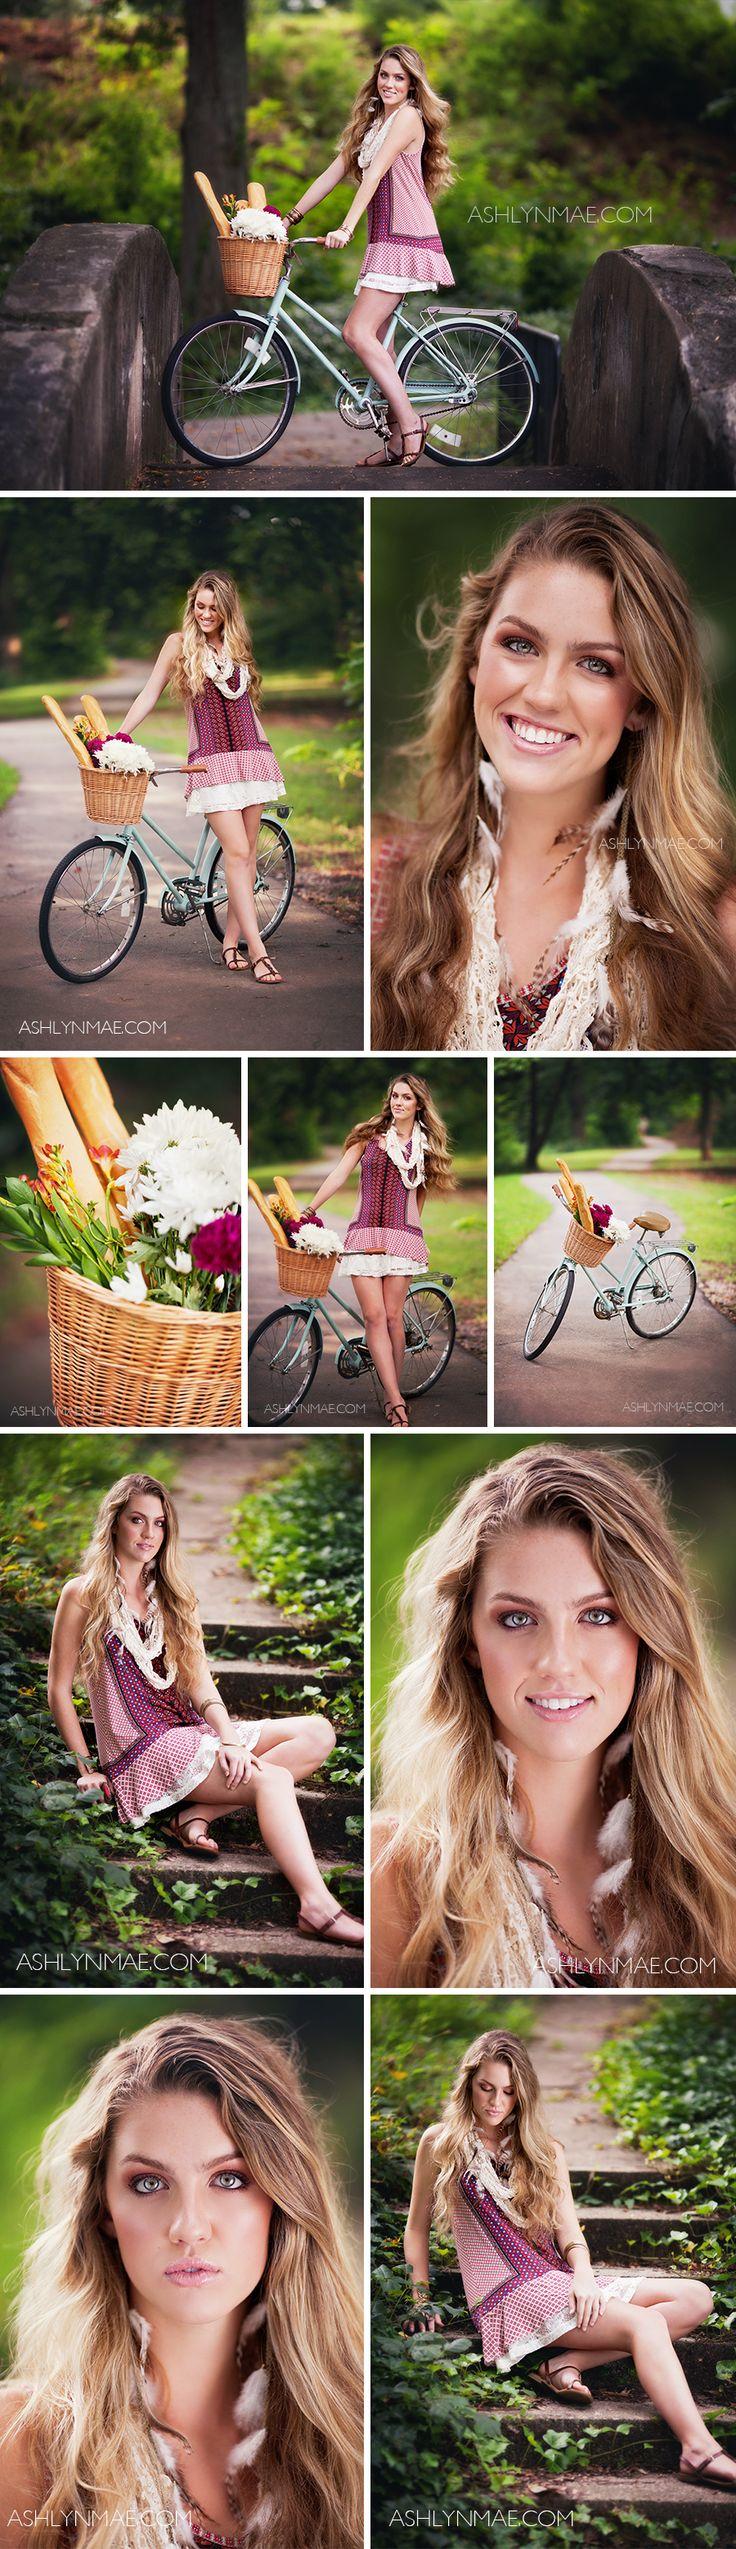 High School Senior Photography #senior #photos #style #boho